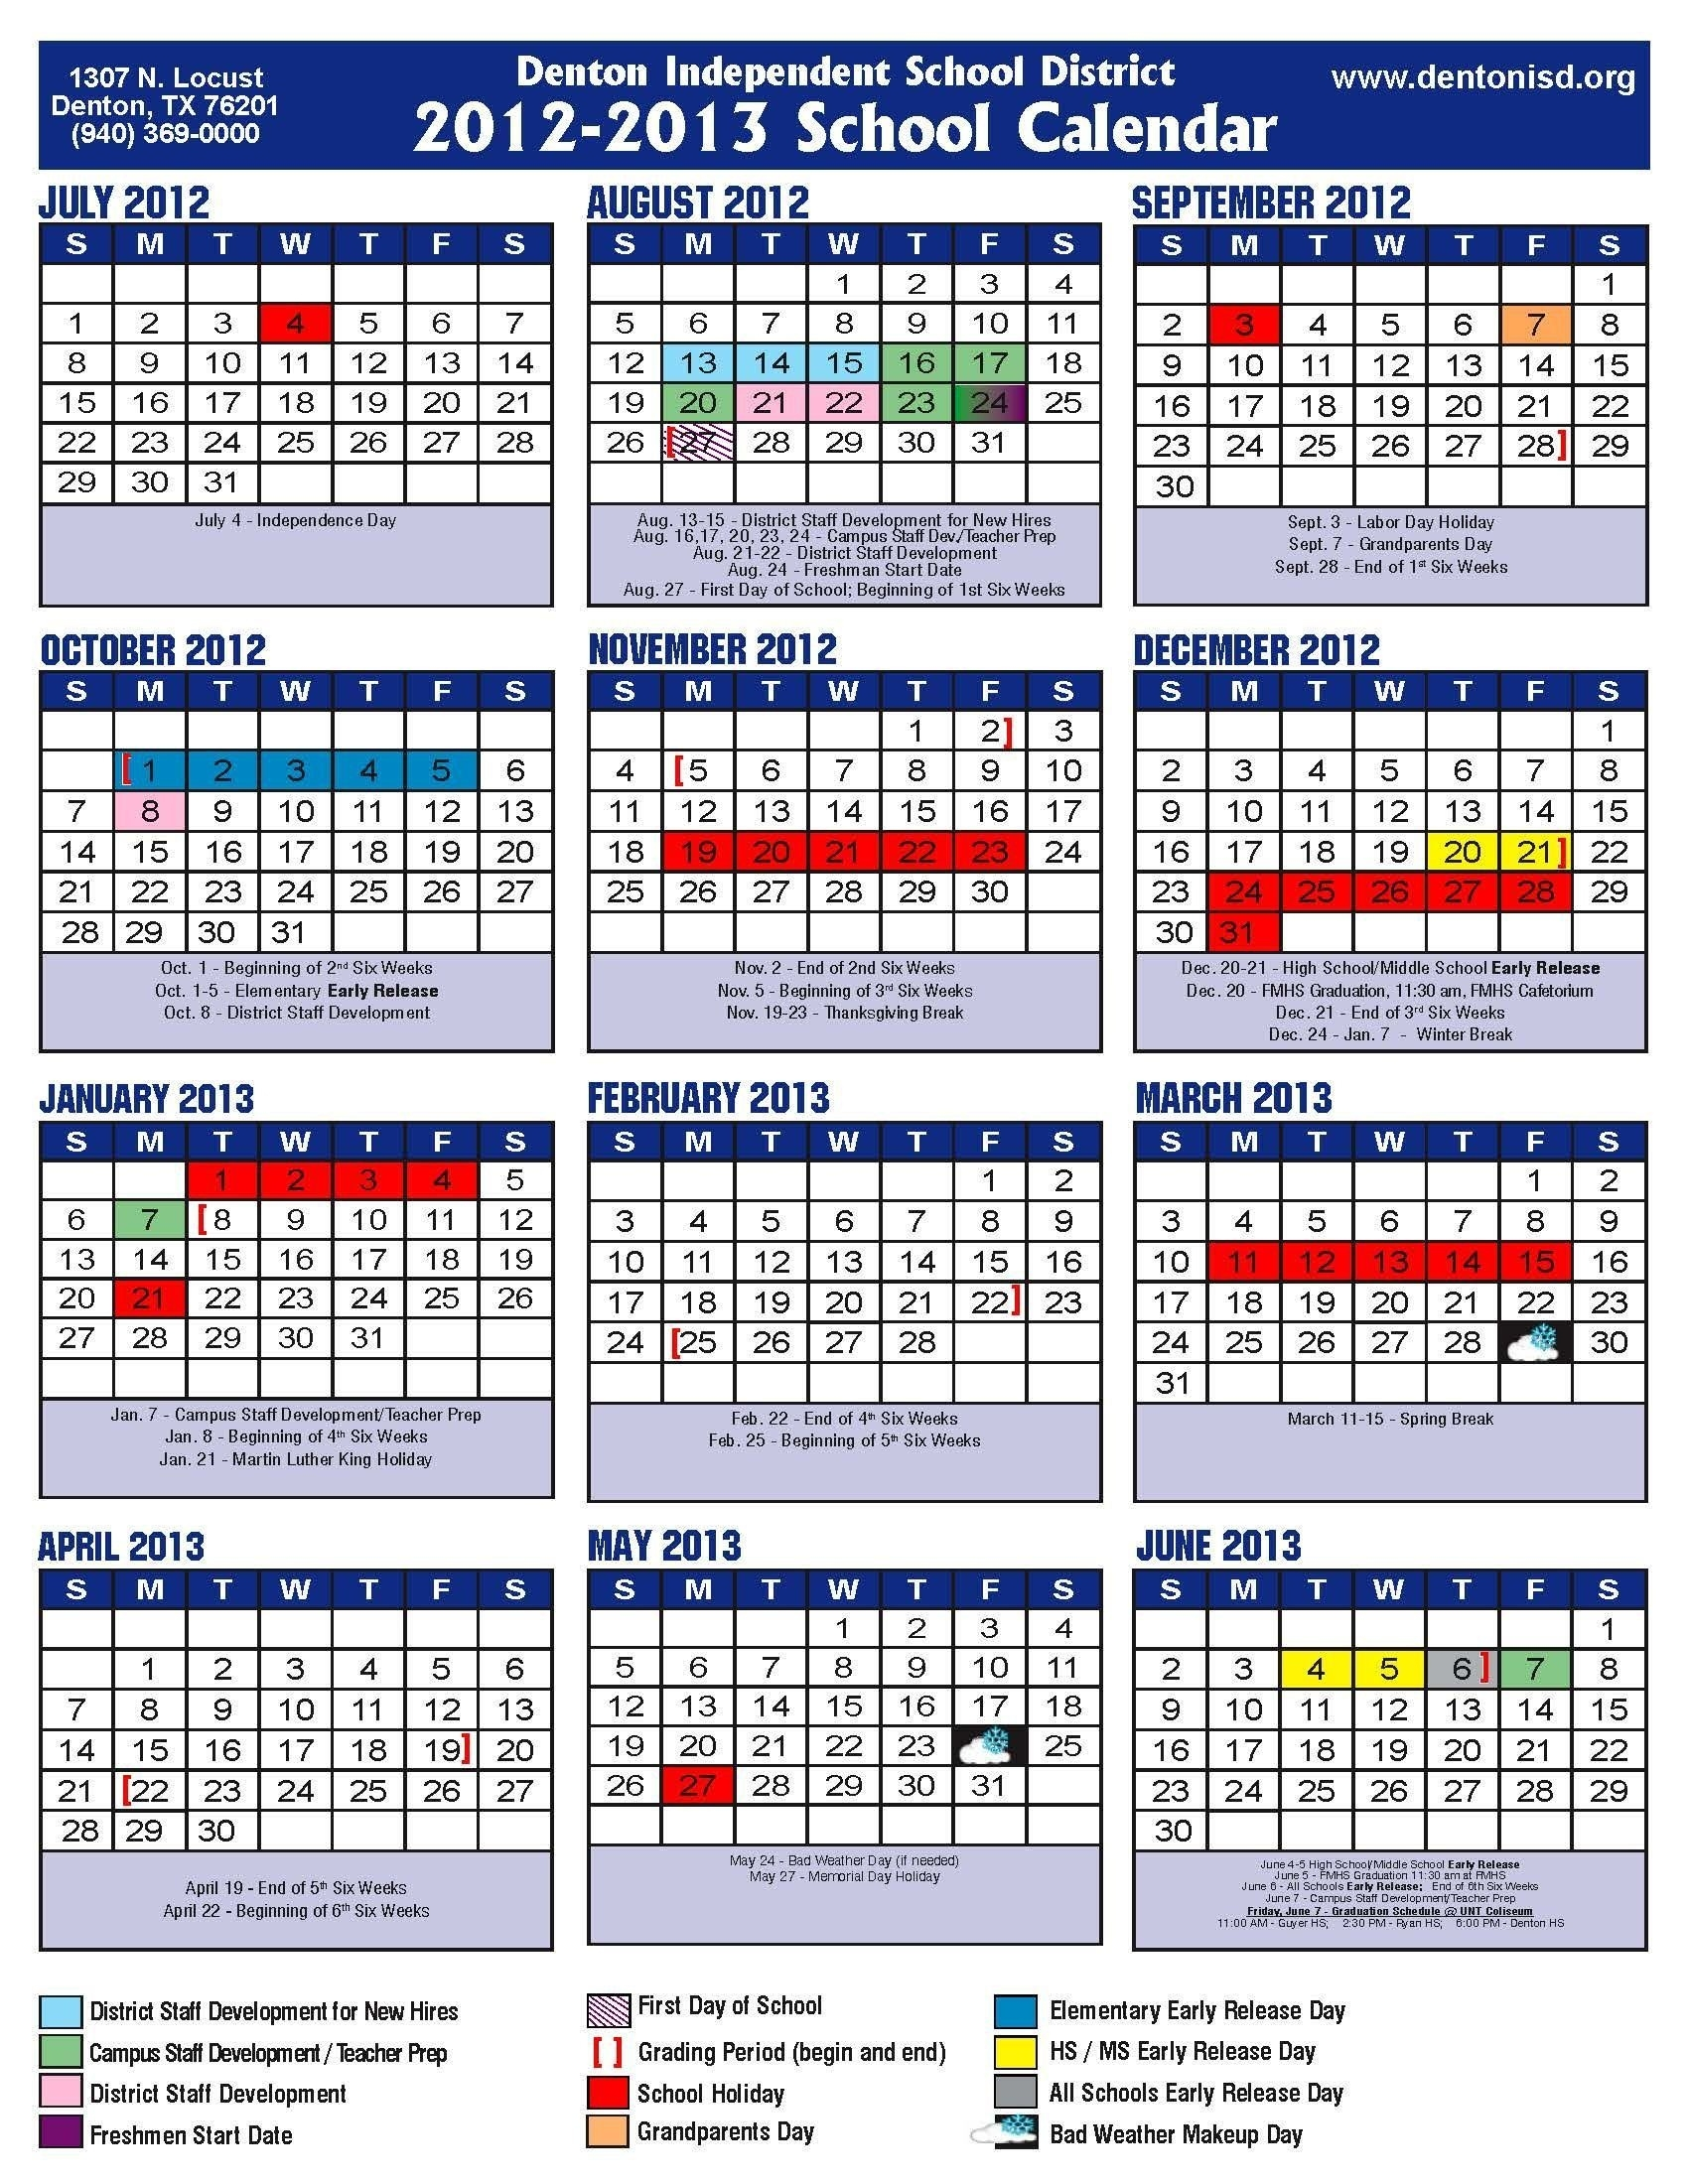 Academic Calendar Disd | 12 Month At A Glance Calendar Template_School Calendar Denton Isd